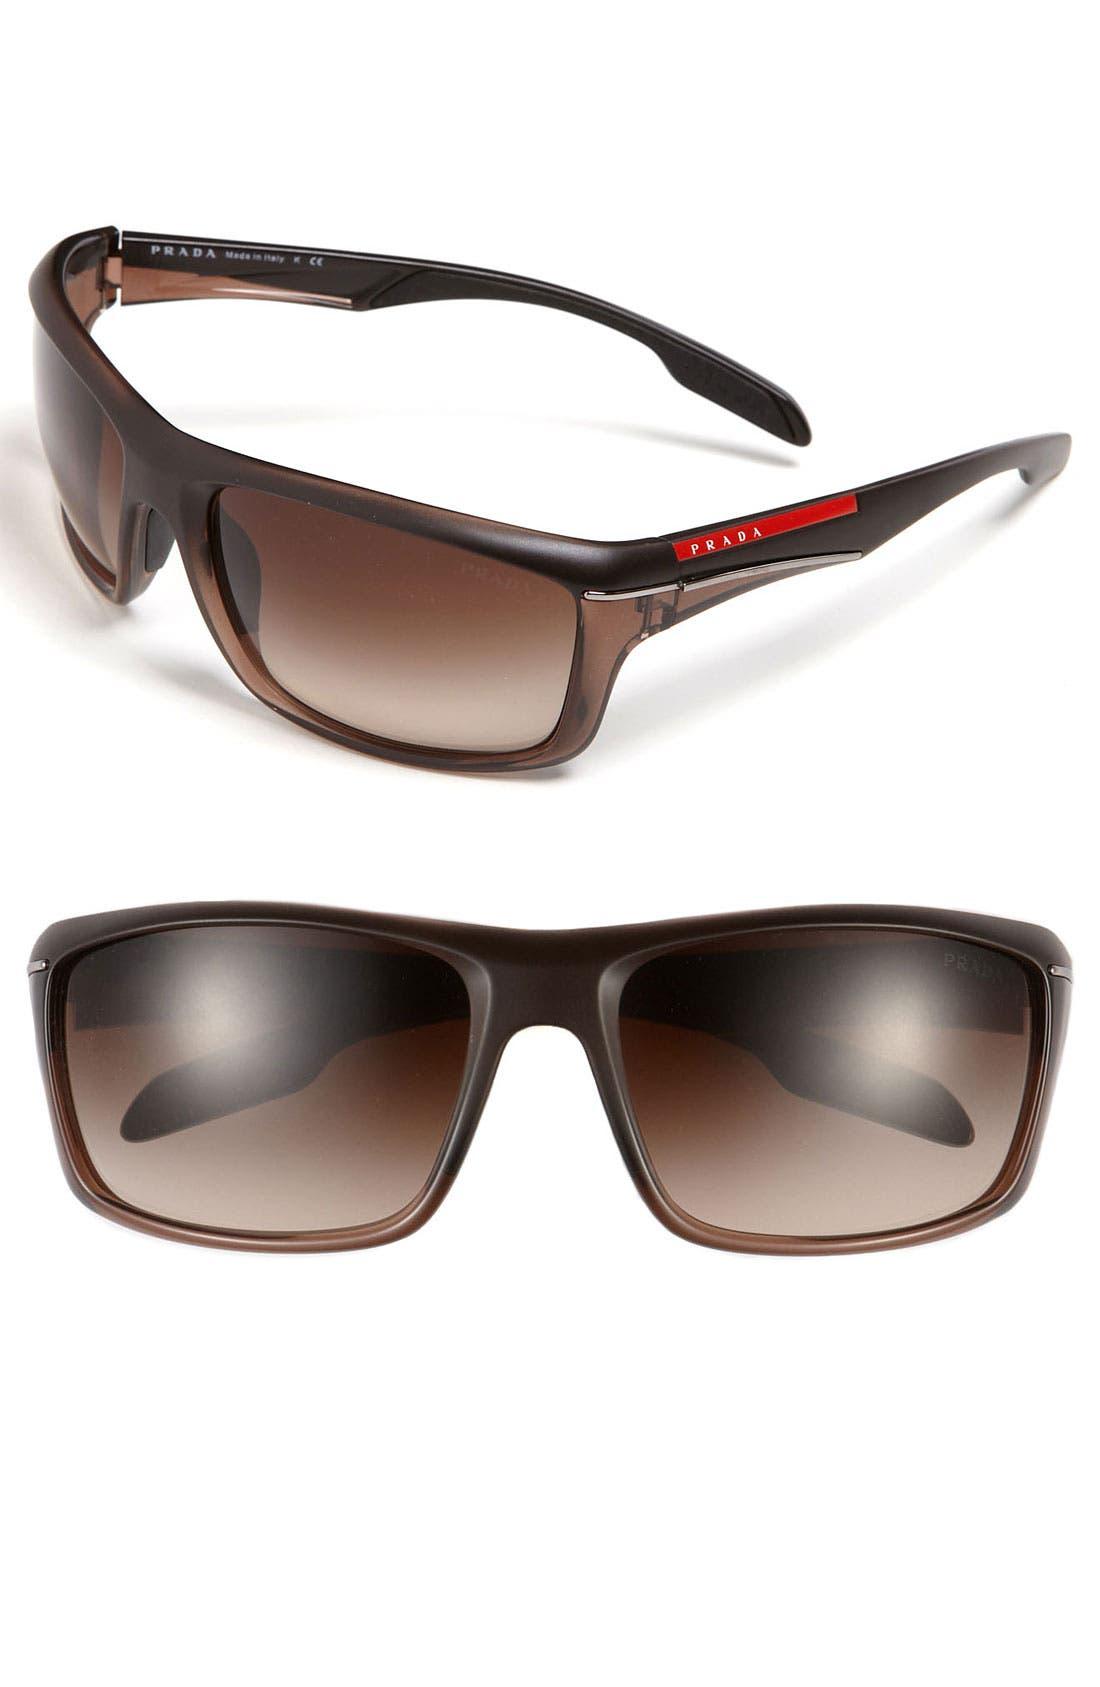 Alternate Image 1 Selected - Prada 'Sport Wrap' 63mm Rectangular Sunglasses